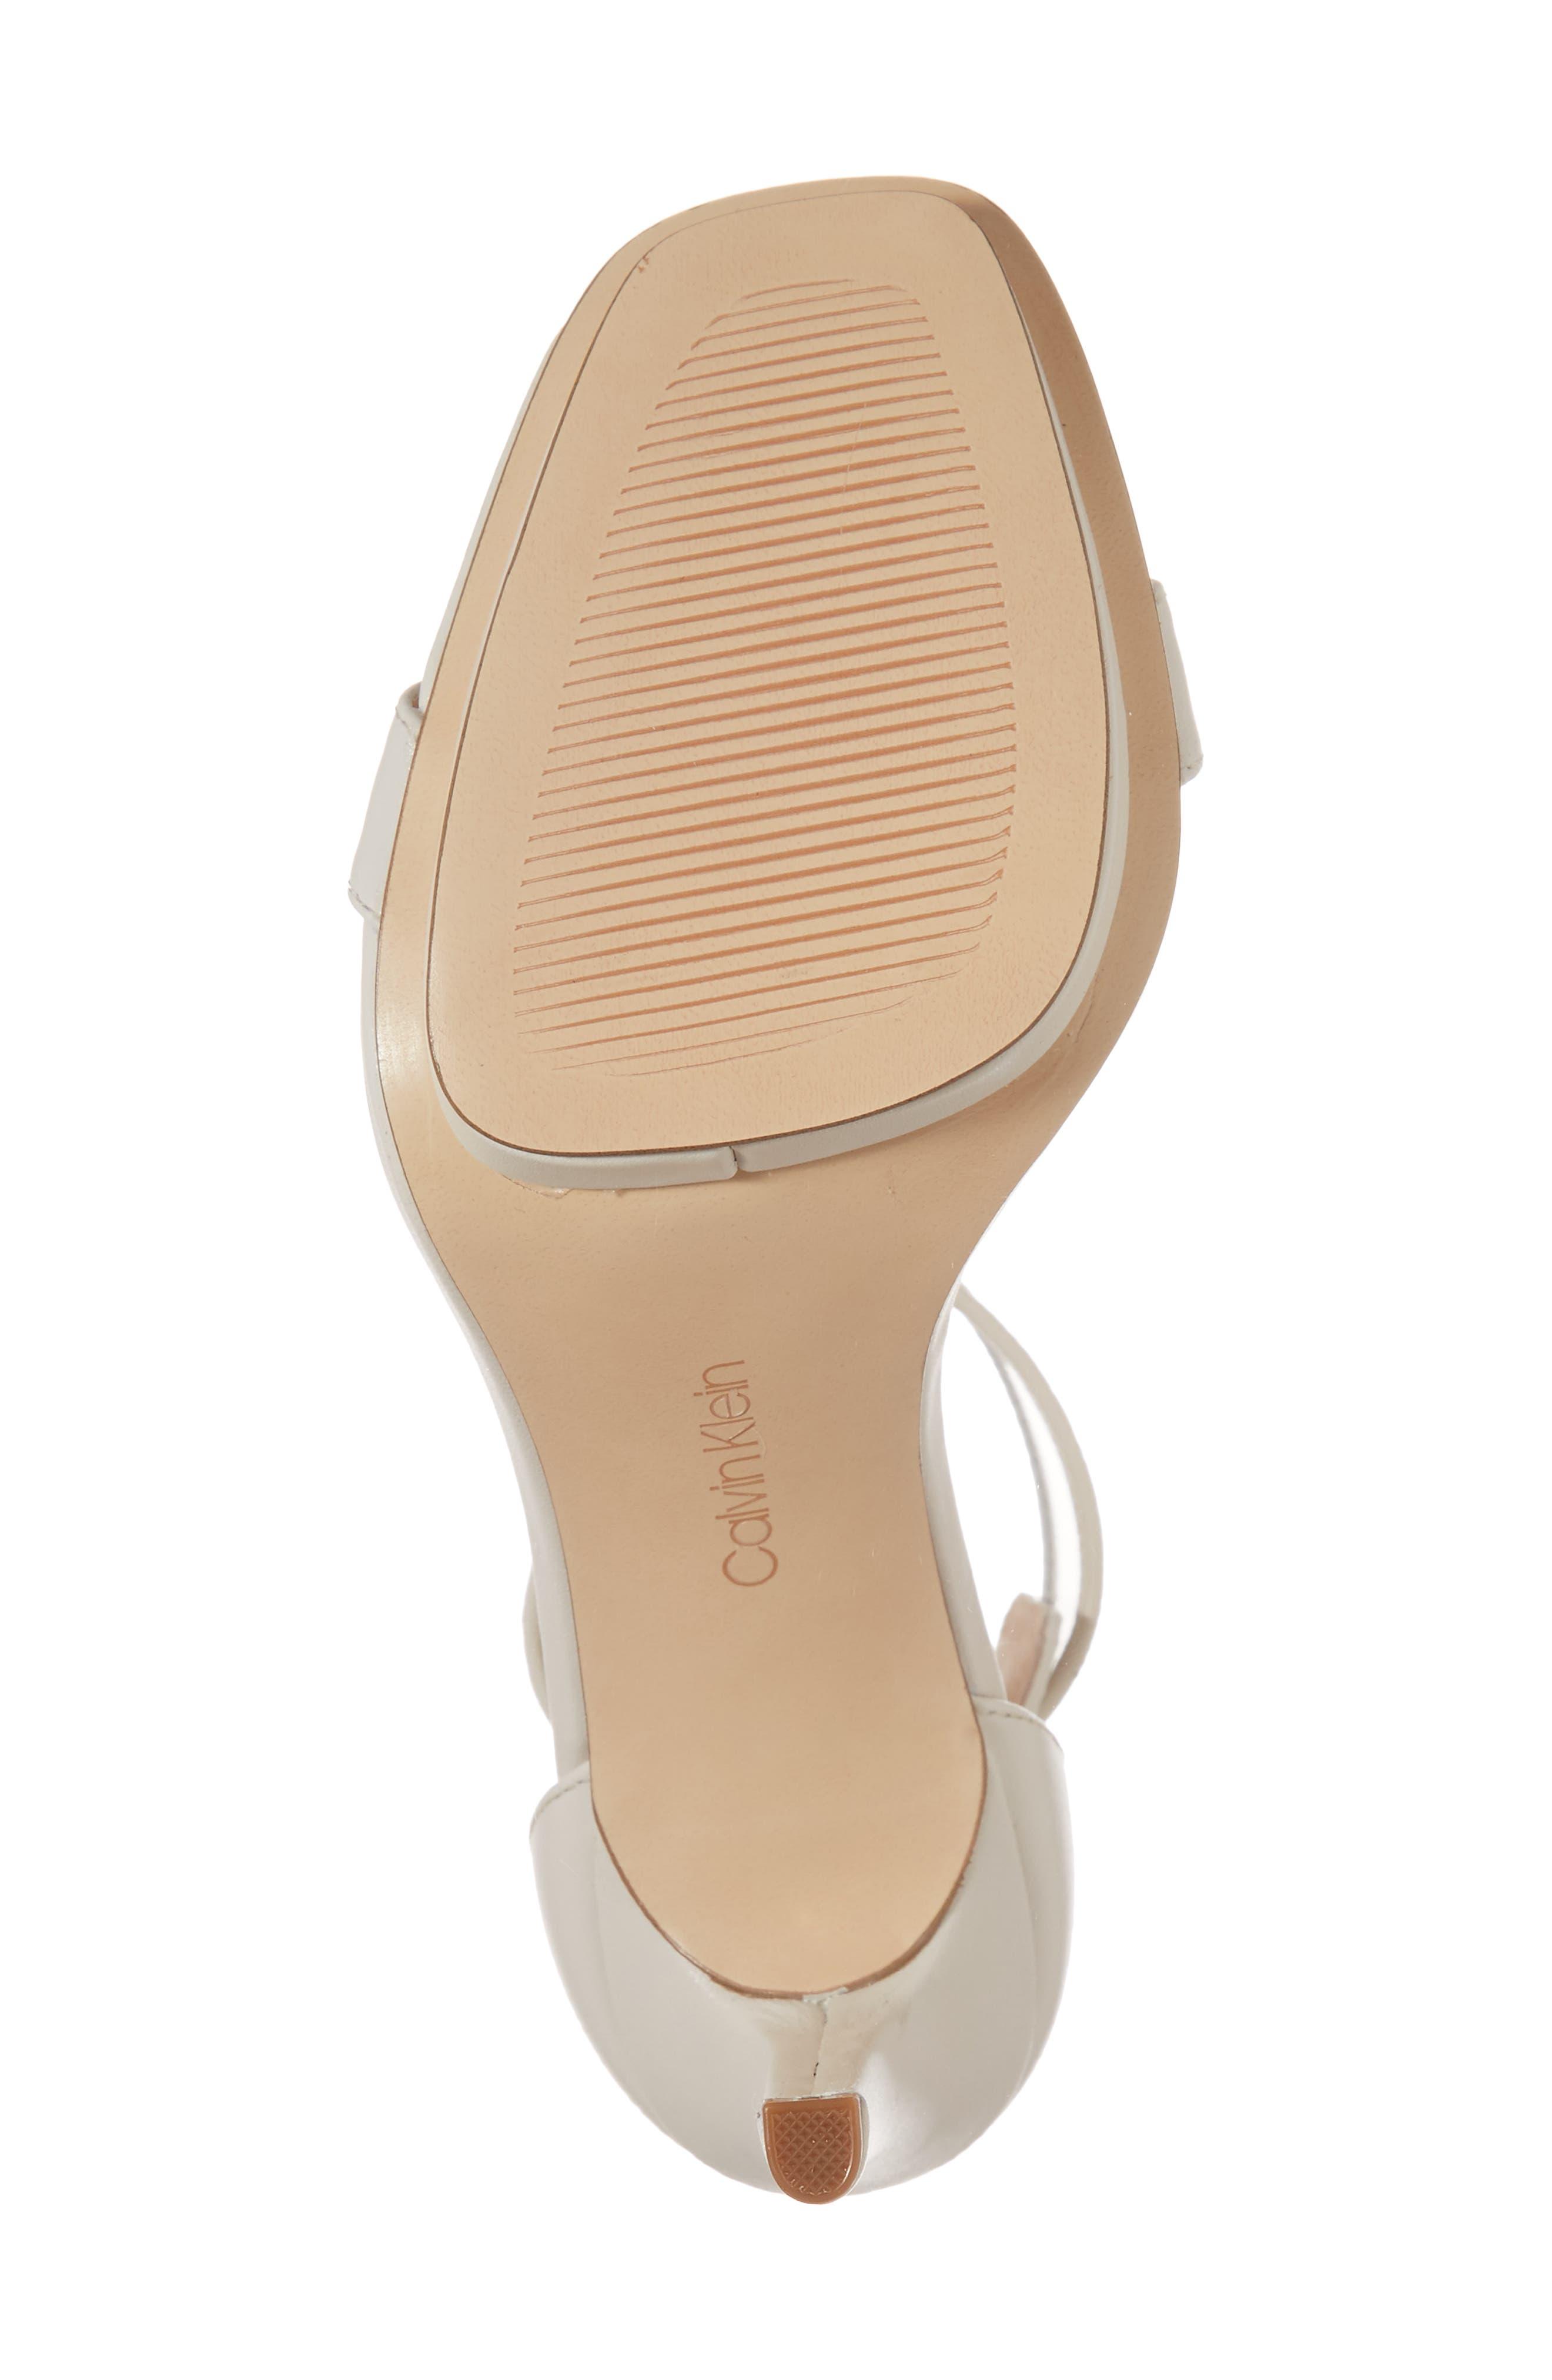 Vable Sandal,                             Alternate thumbnail 6, color,                             Soft White Leather